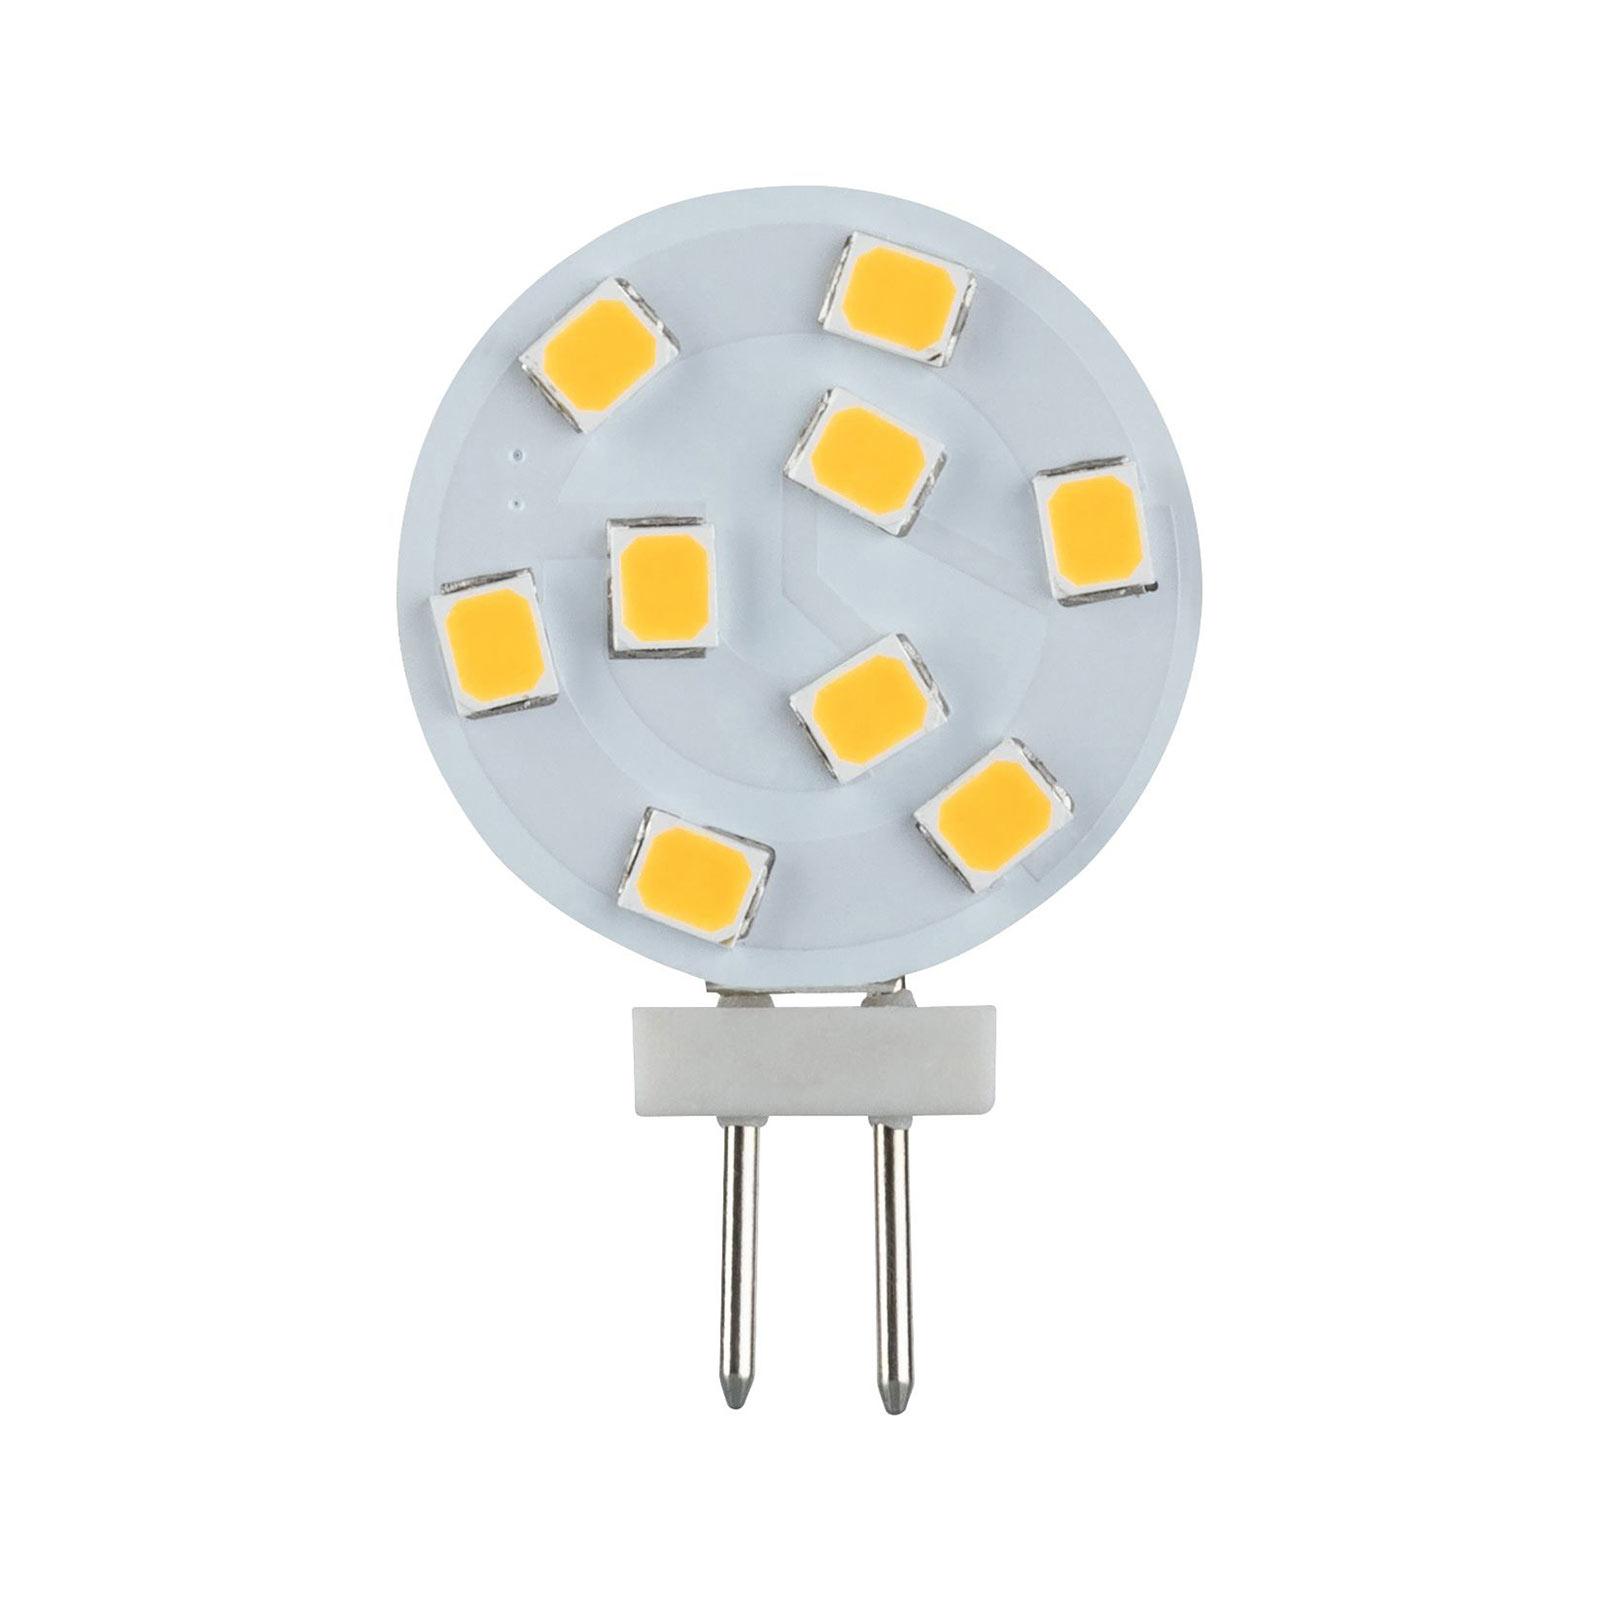 Paulmann LED-stiftpære G4 2,5 W 2700K